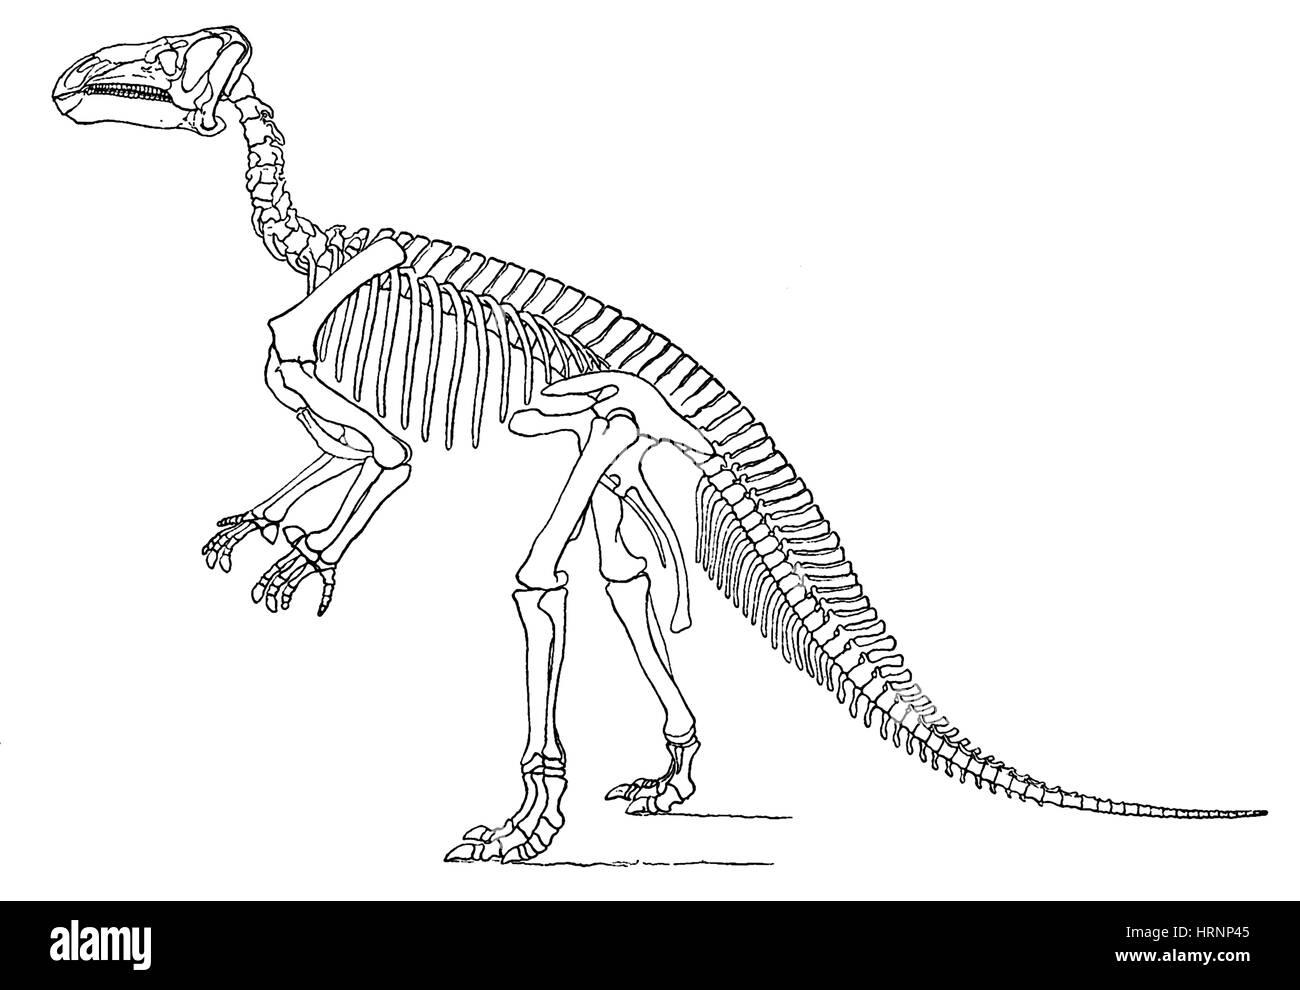 Iguanodon, Mesozoic Dinosaur - Stock Image